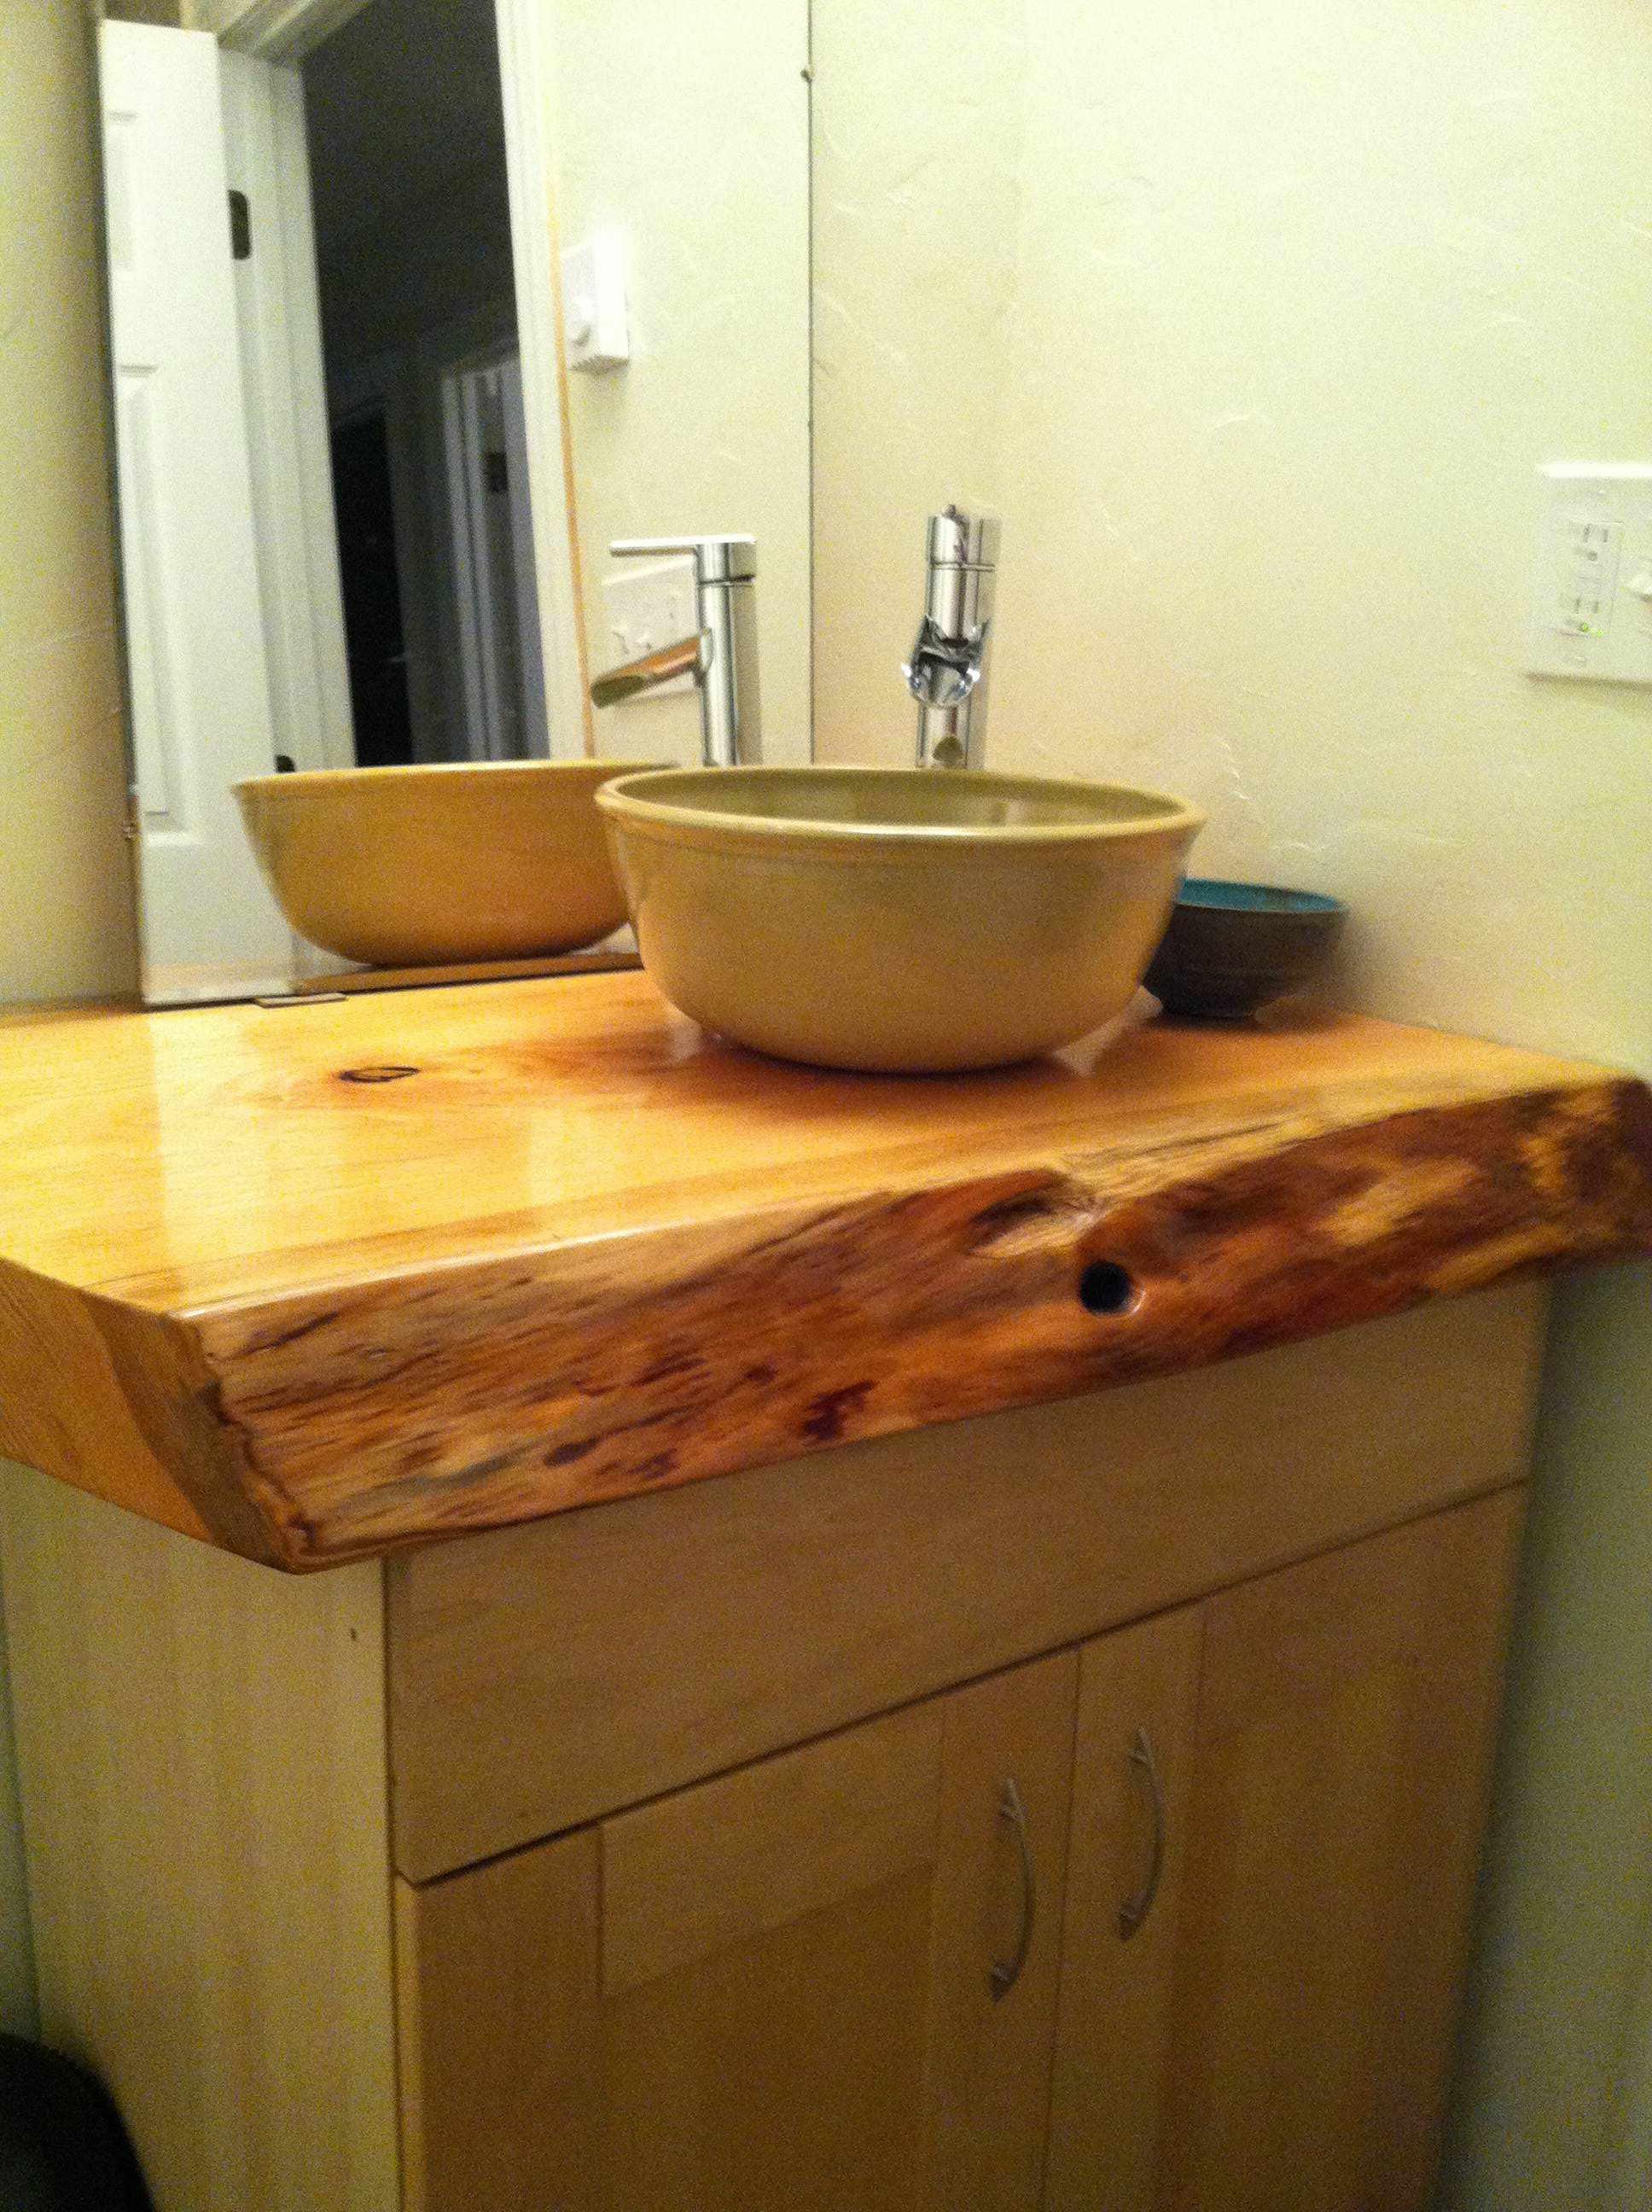 Doug fir slab, turned into a gorgeous bathroom counter top